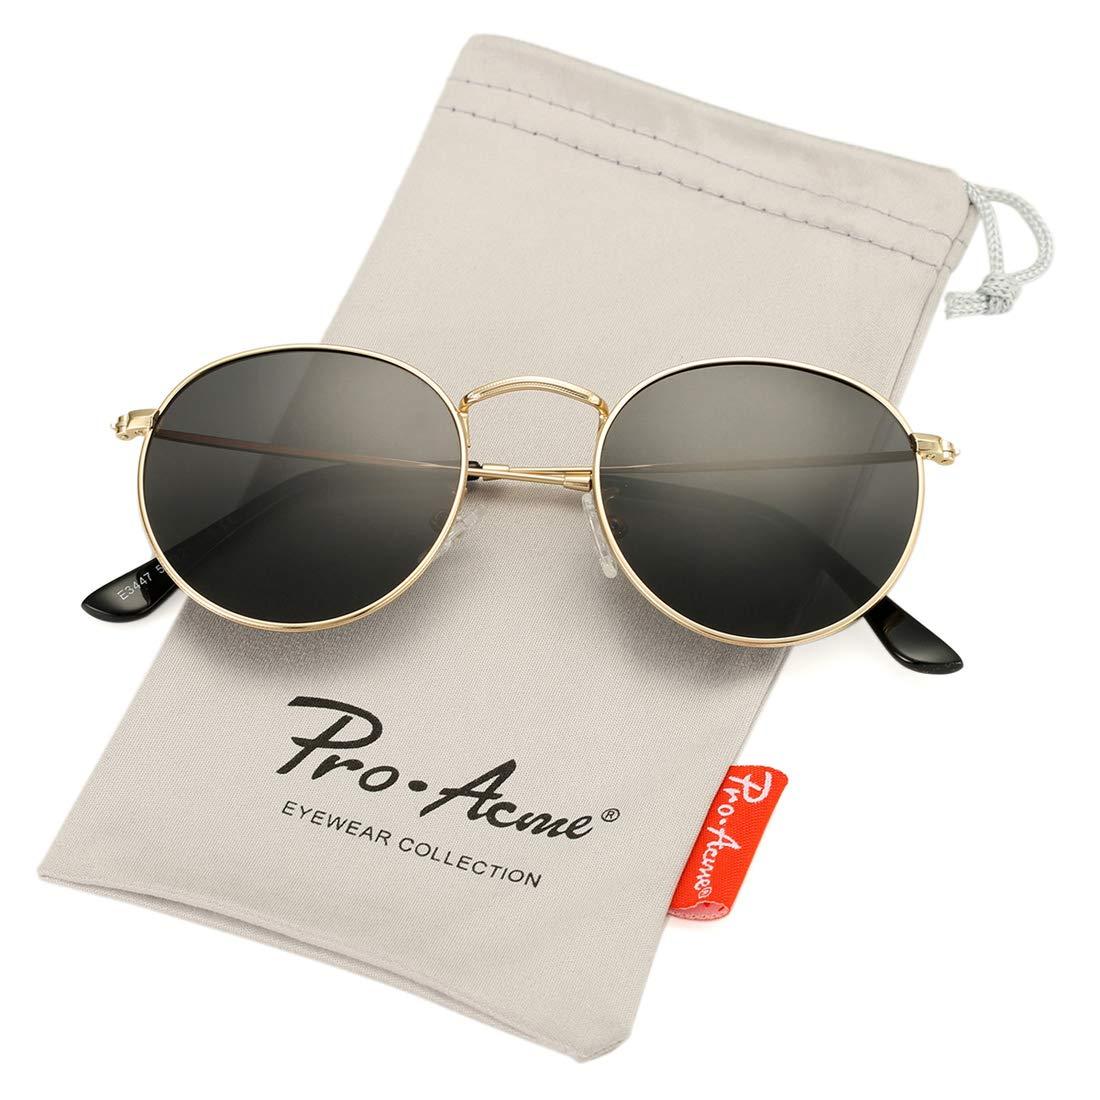 Pro Acme Small Round Metal Polarized Sunglasses for Women Retro Designer Style (Gold Frame/Smoke Lens) by Pro Acme